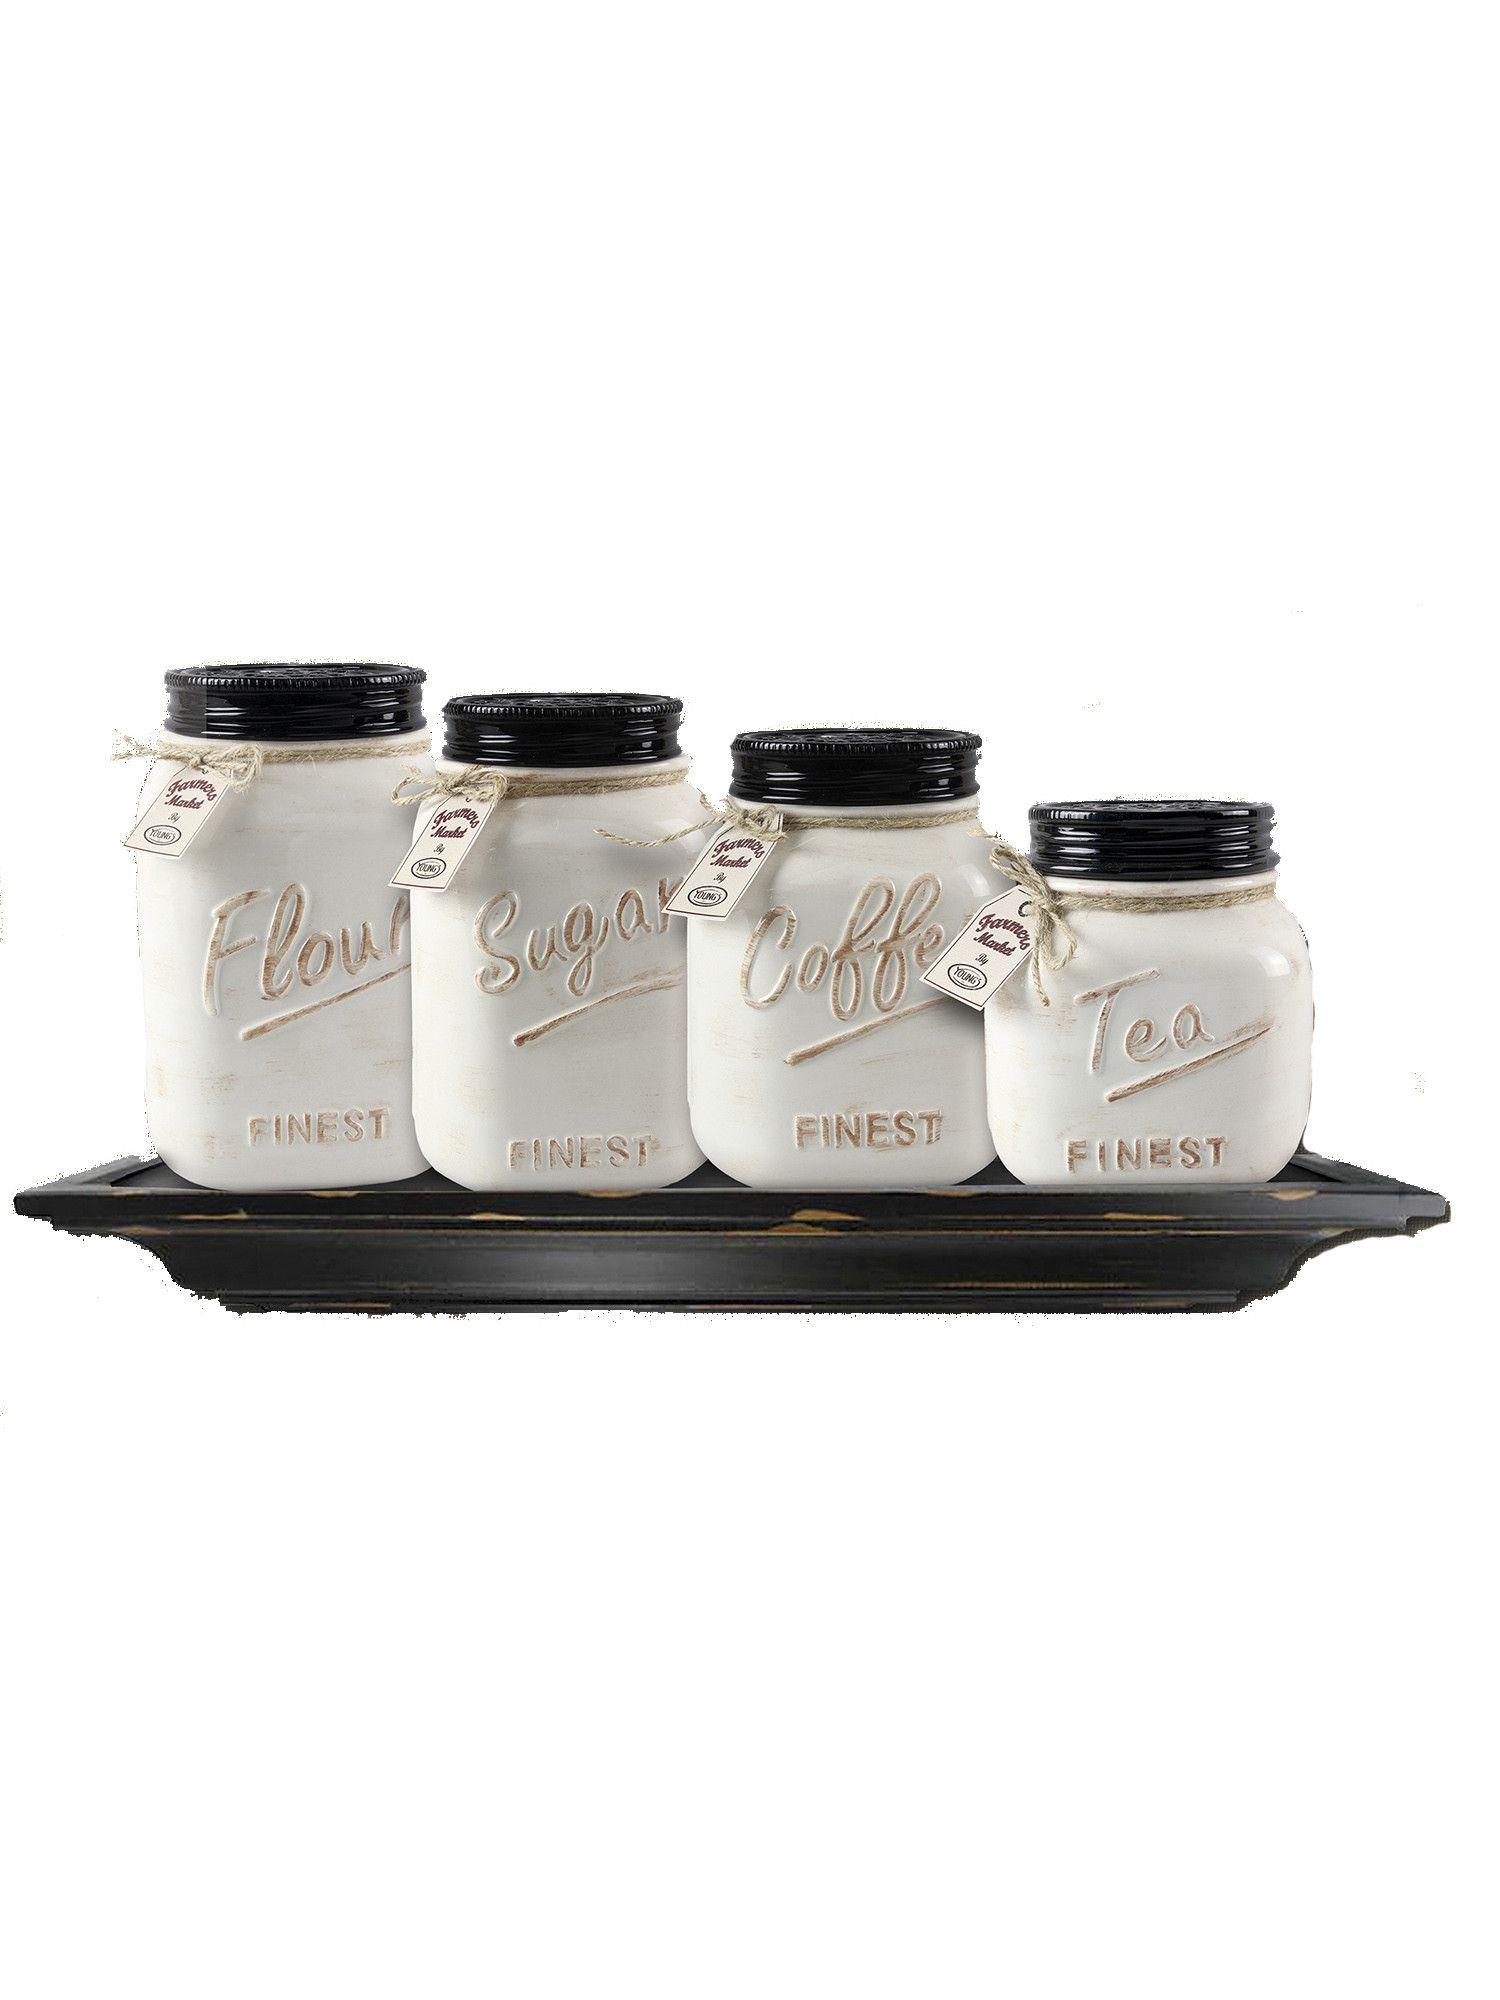 Off White Canister Mason Jar Set of 4 | Canister sets, Jar and Kitchens